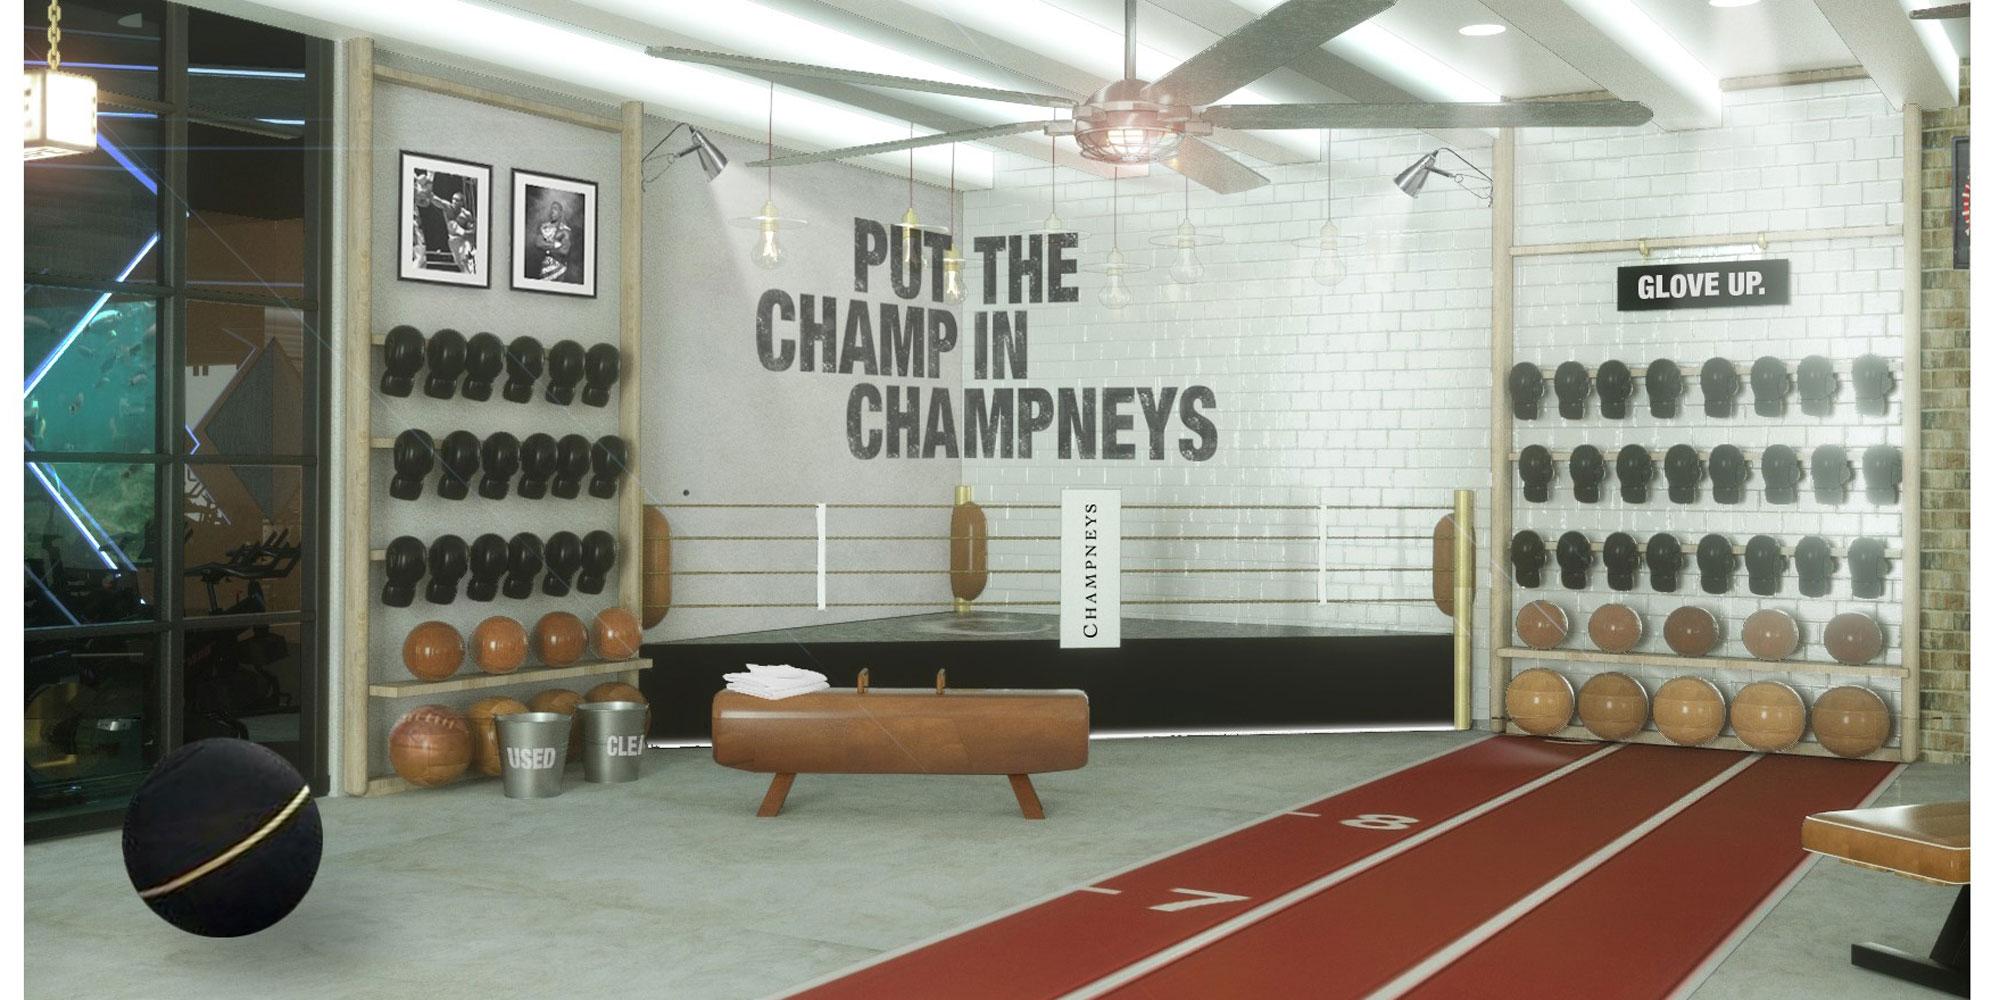 champneys-New-Gym.jpg